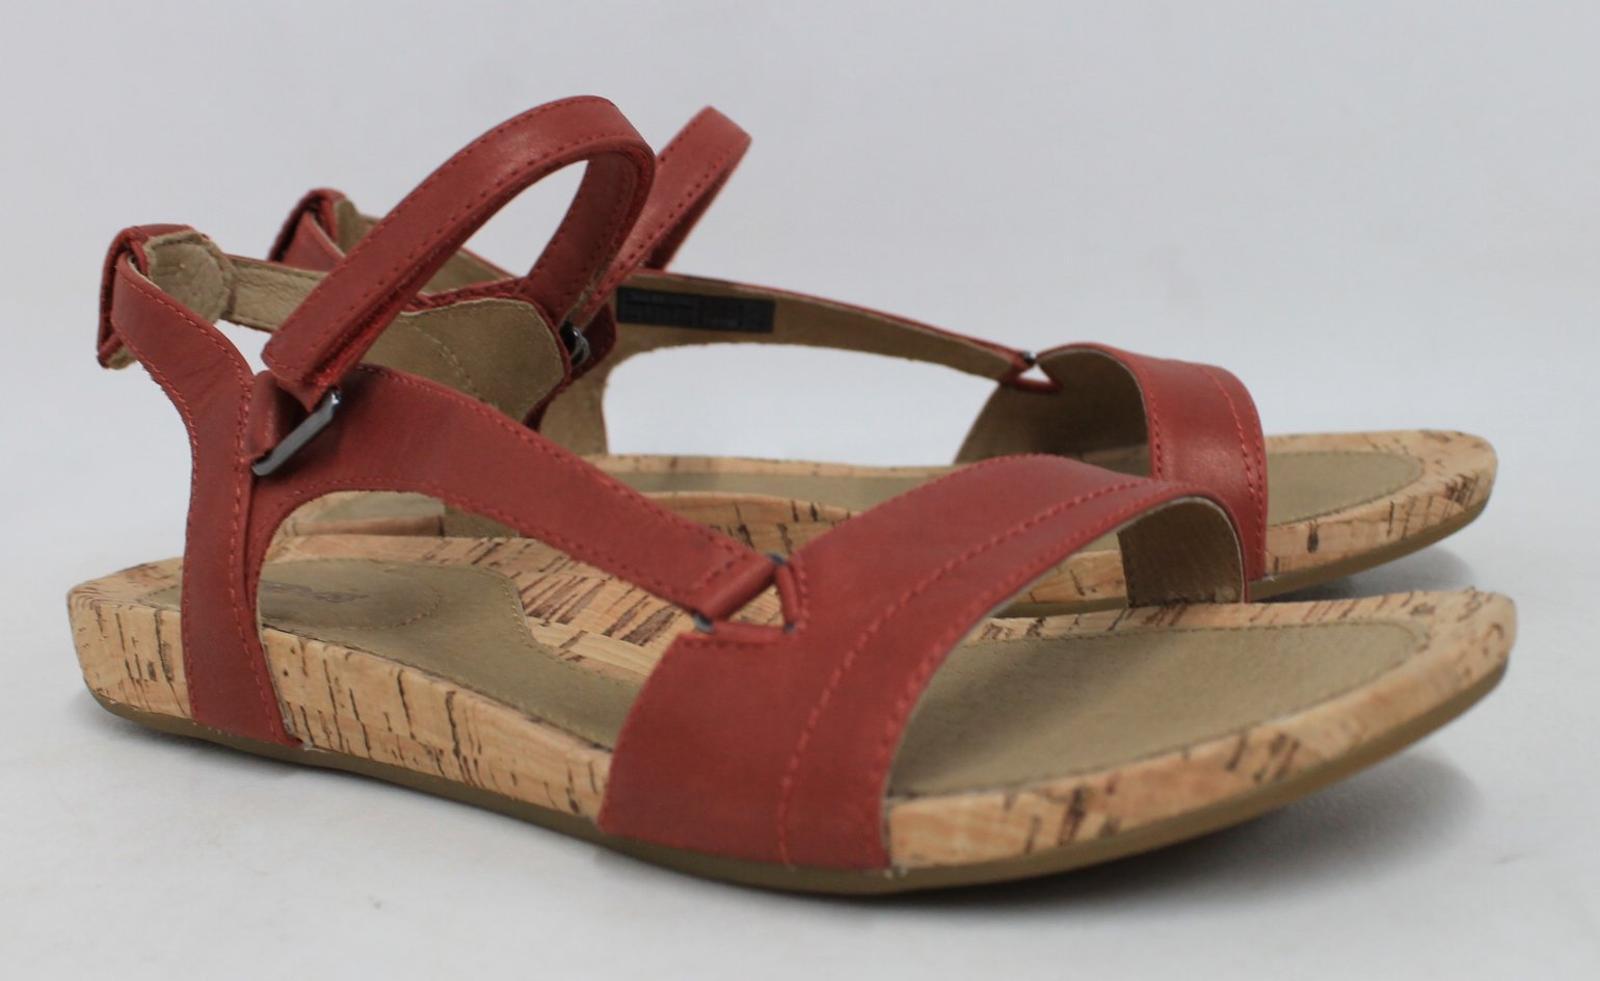 Flat Leather Bnib Cork Sole Scarpe Strap Ankle Teva Sandali Red Uk7 Ladies wfxxqOYB